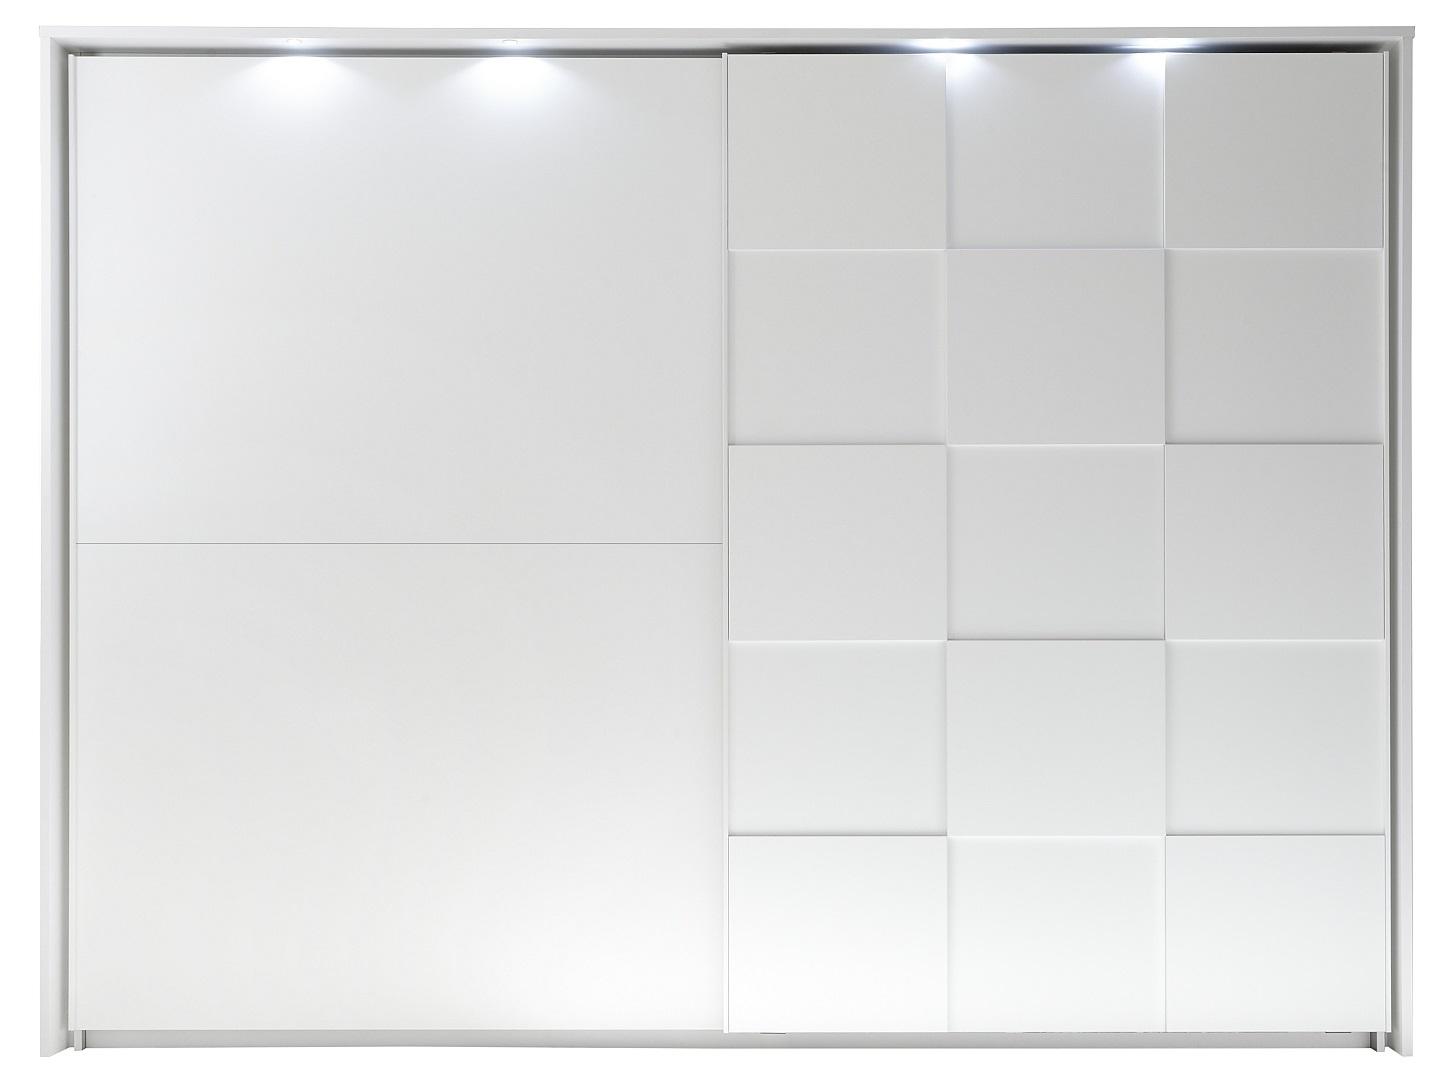 Schuifdeurkast Ottica 275 cm breed in mat wit